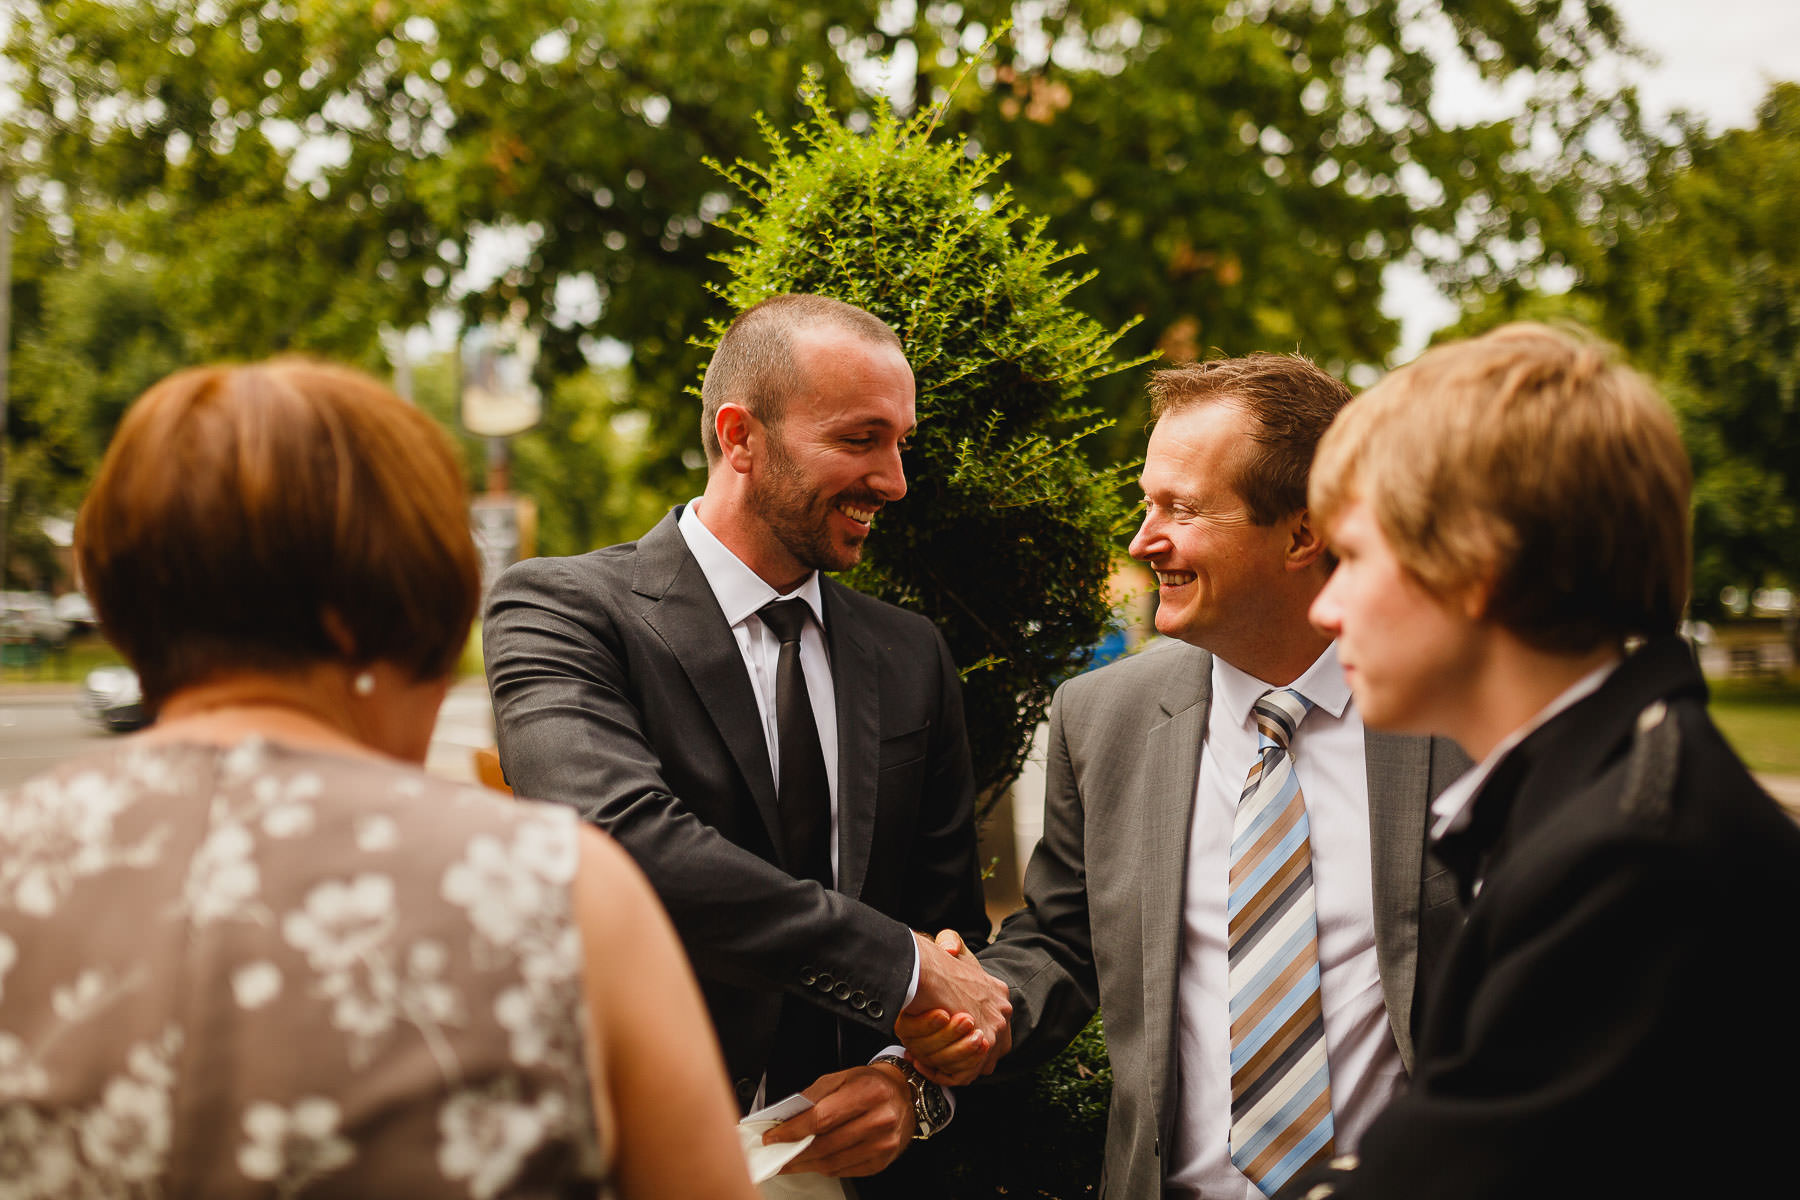 kew gardens wedding photography astra duncan4